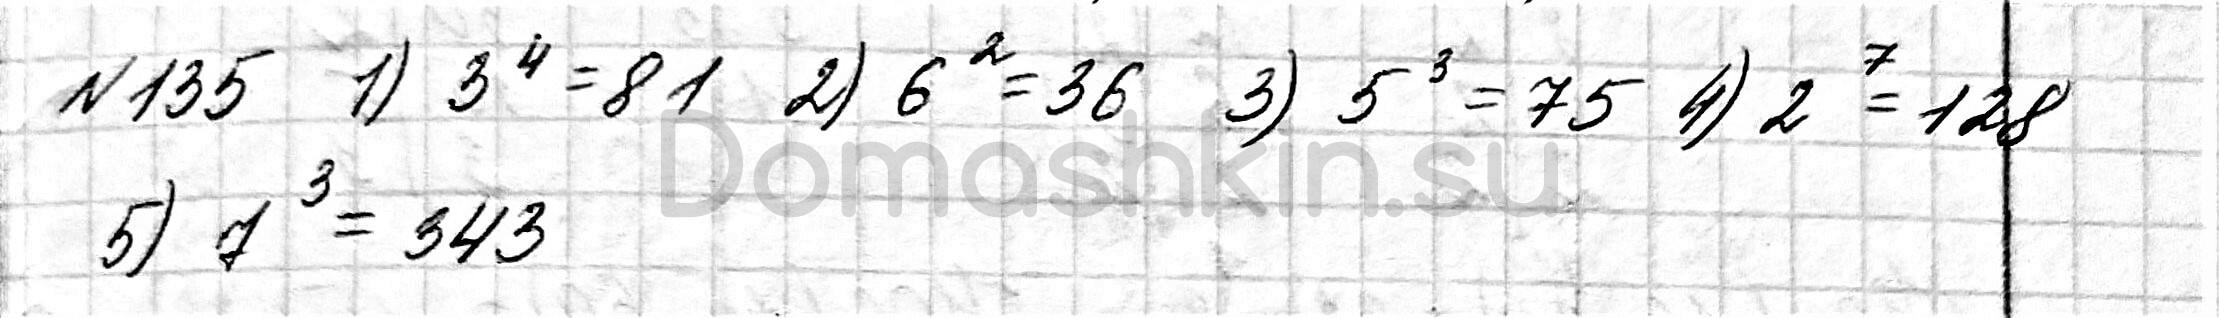 Математика 6 класс учебник Мерзляк номер 135 решение